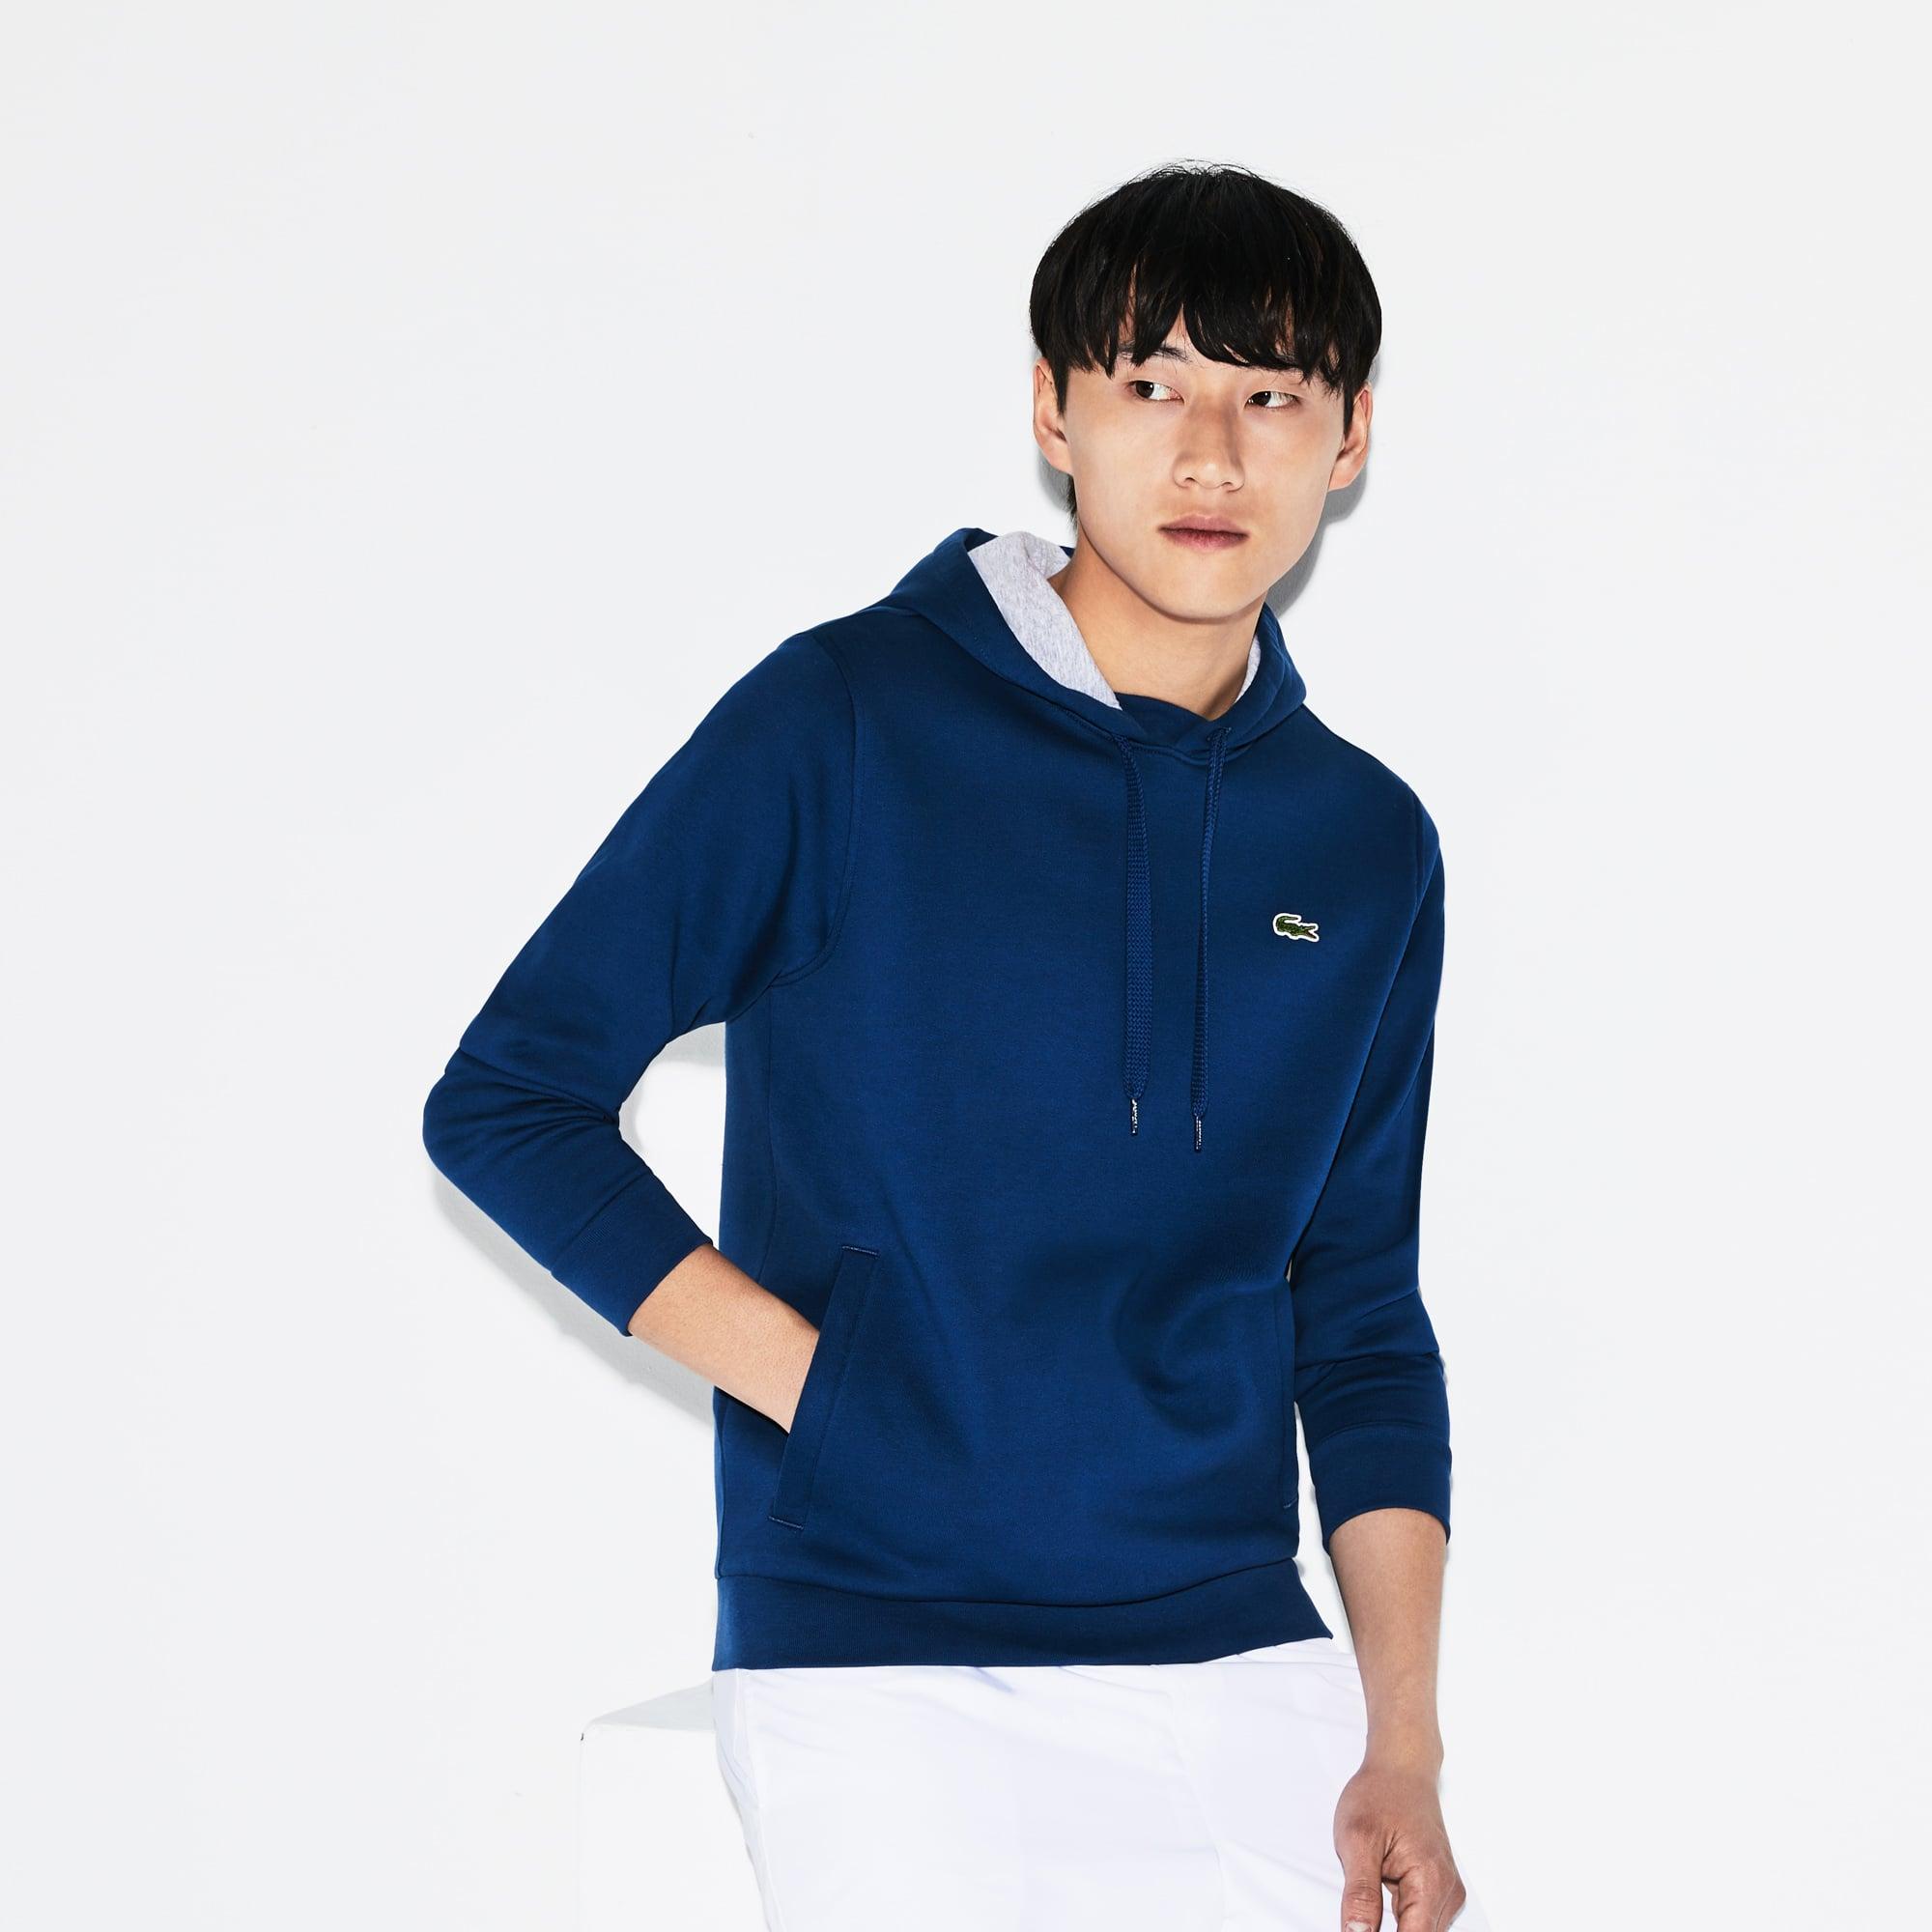 Rayas Suéter Para Hombre - Compra lotes baratos de Rayas